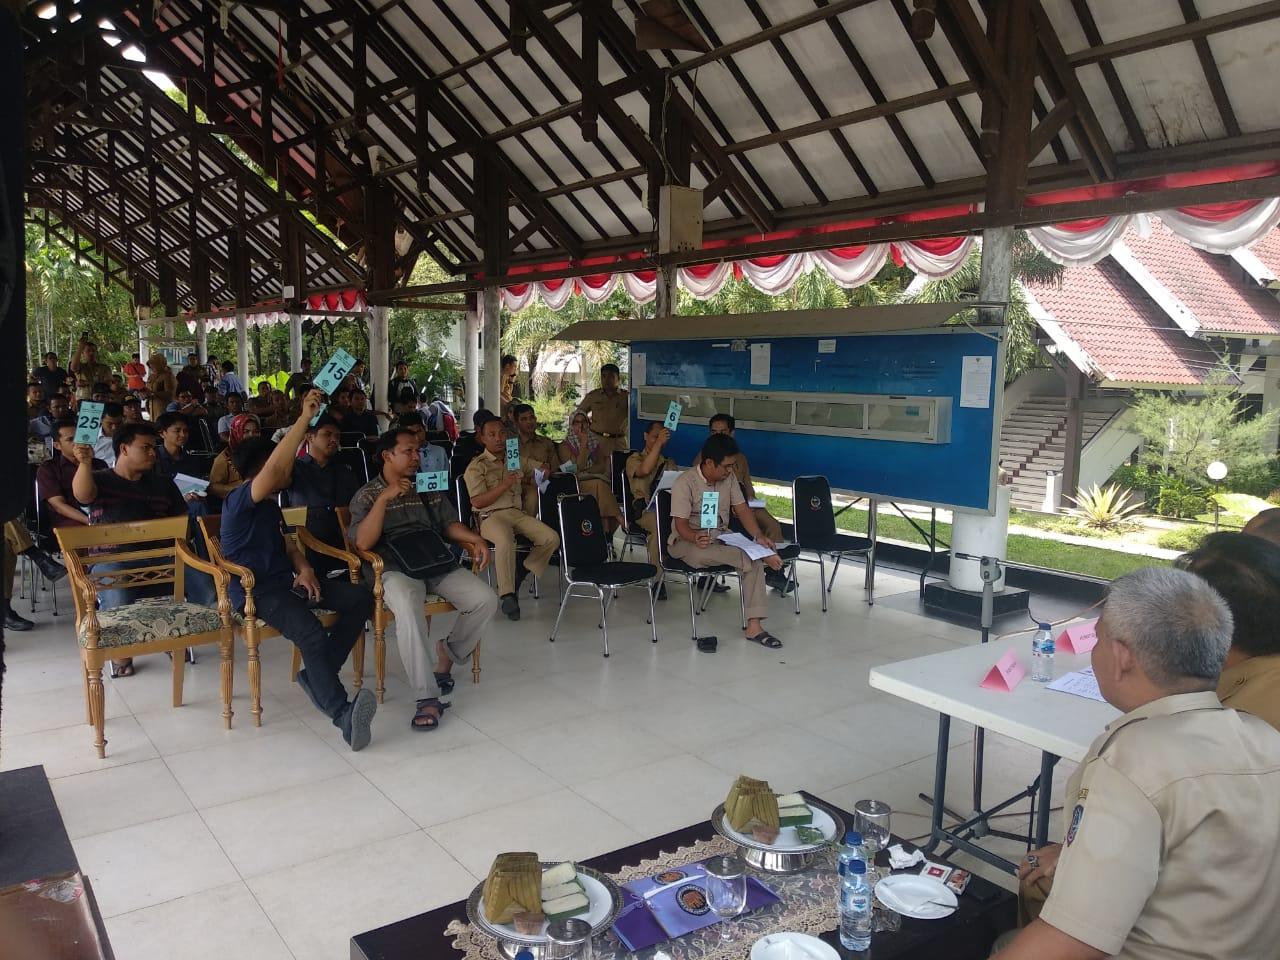 Pemerintah Provinsi Sulawesi Selatan Gandeng KPKNL Makassar Lelang Kendaraan Dinas